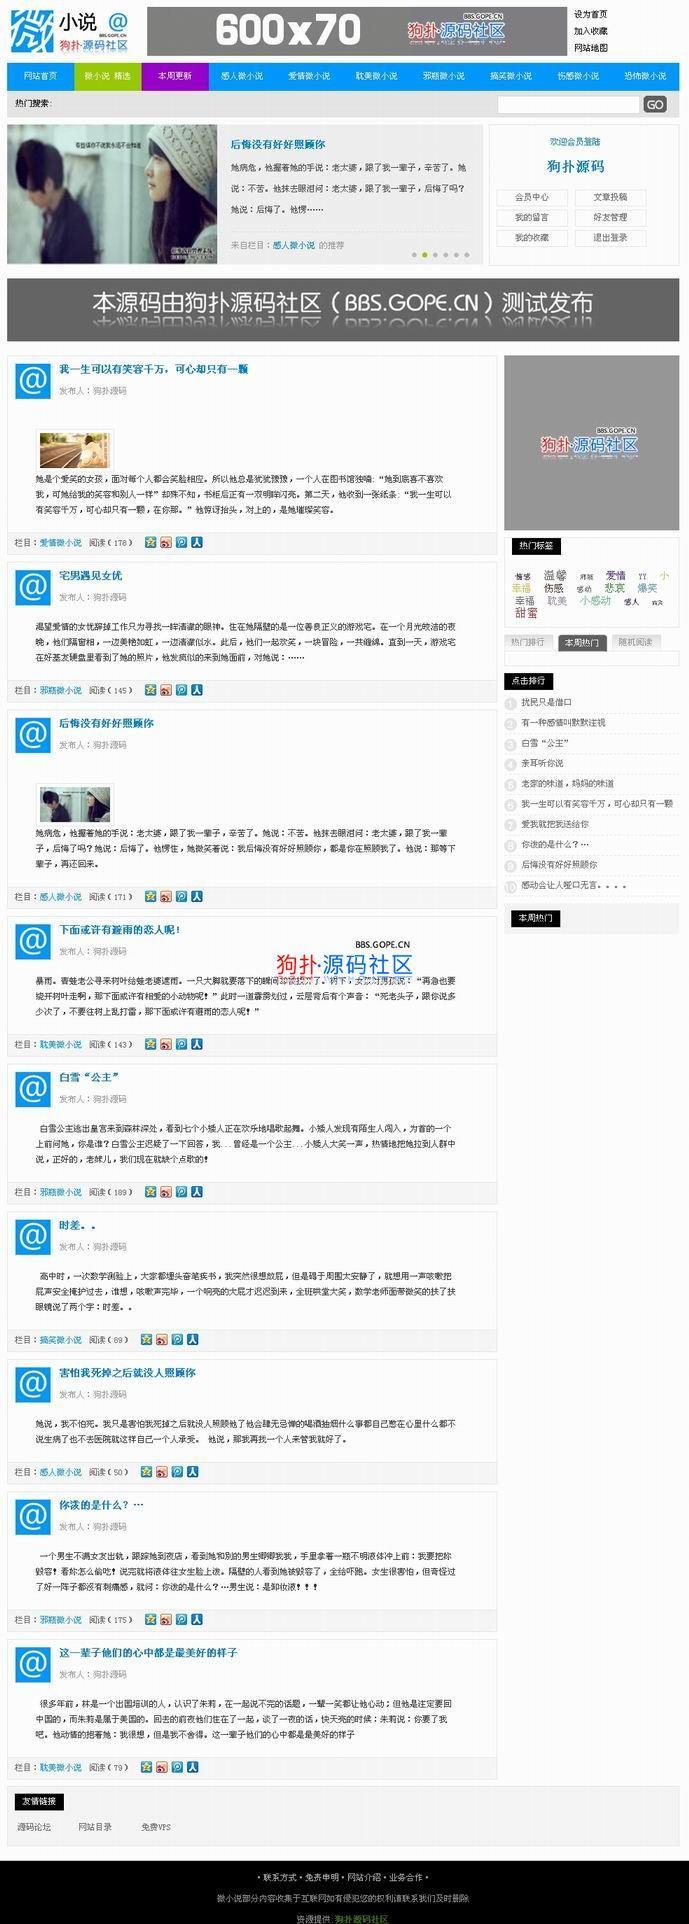 【php】微小说 清新文章站 笑话美文网源码,垂直文章展示,dede内核,模板清新